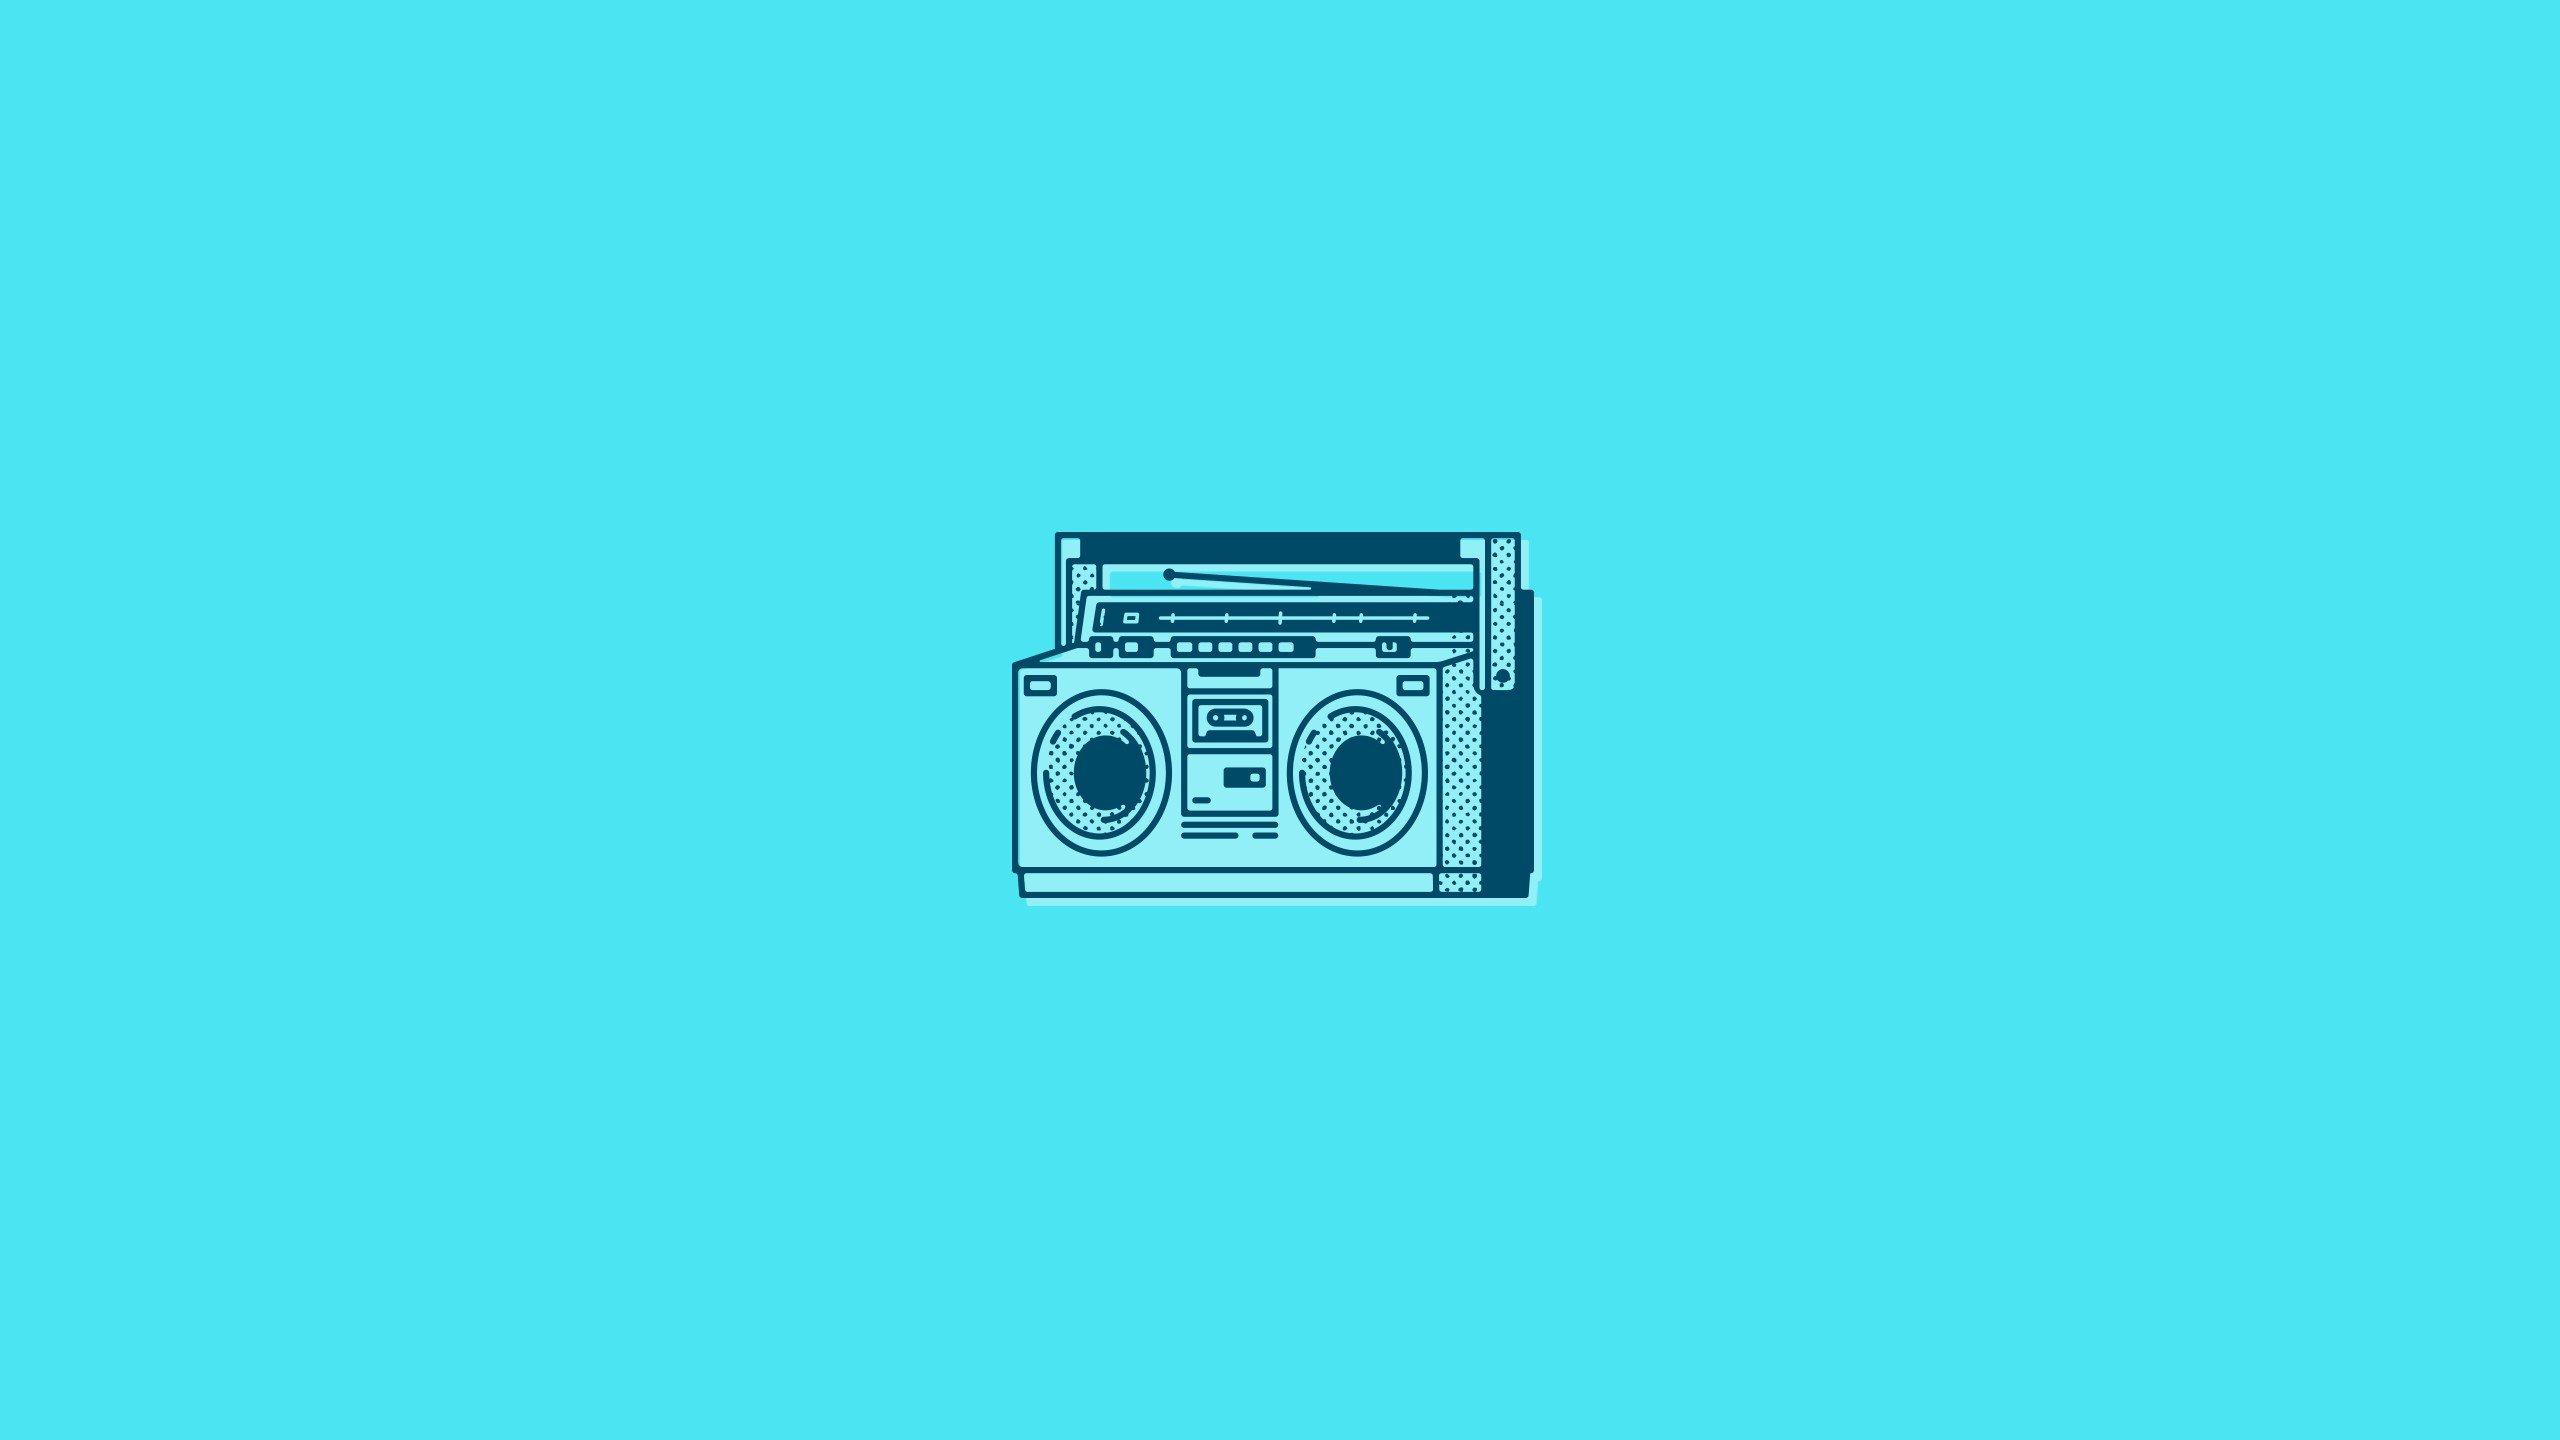 wallpaper 2560x1440 px antenna blue background boombox